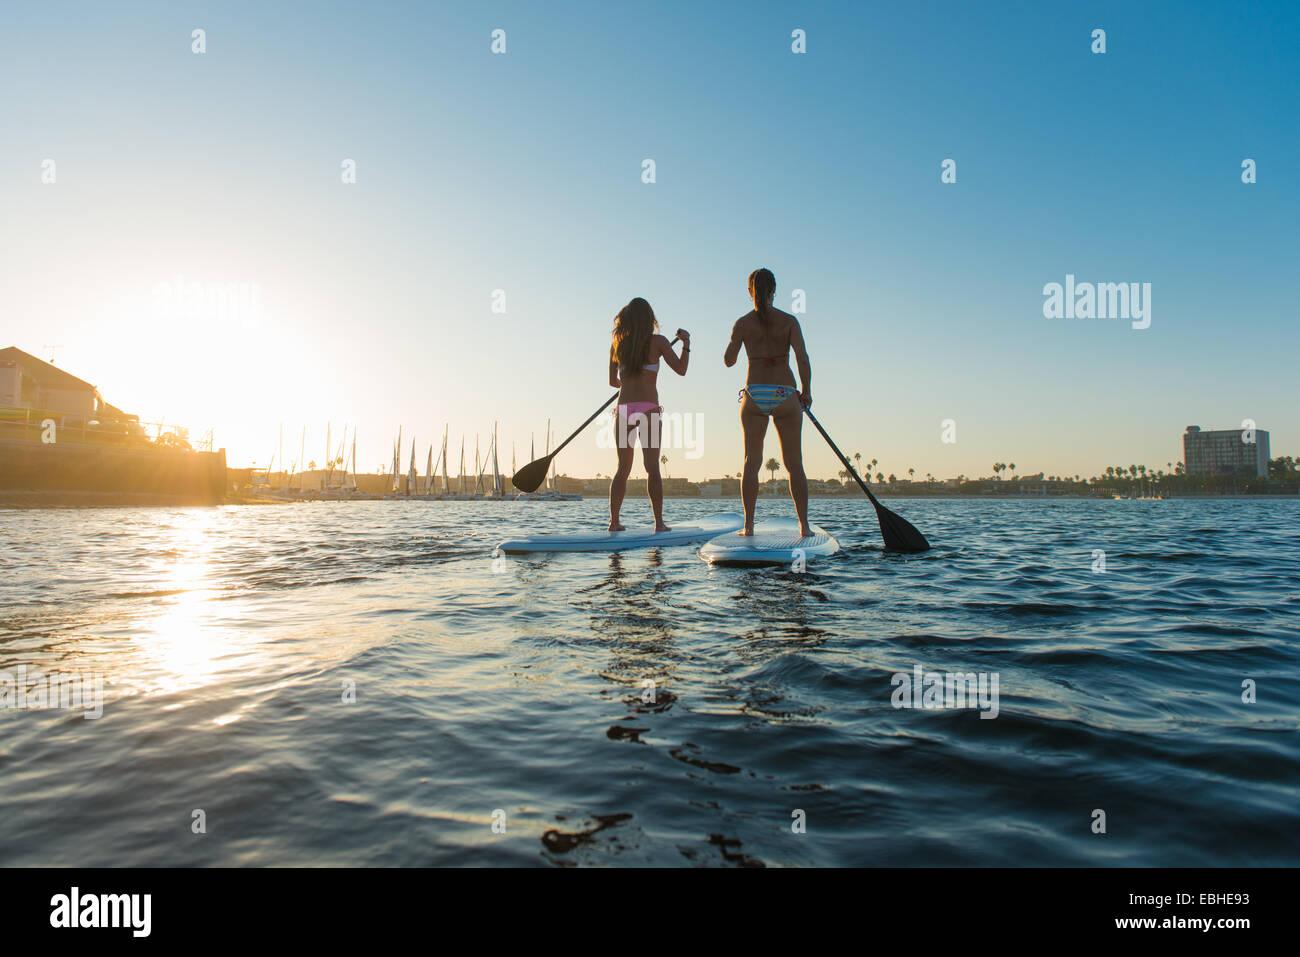 Vista trasera de dos mujeres levántate paddleboarding, Mission Bay, San Diego, California, EE.UU. Imagen De Stock